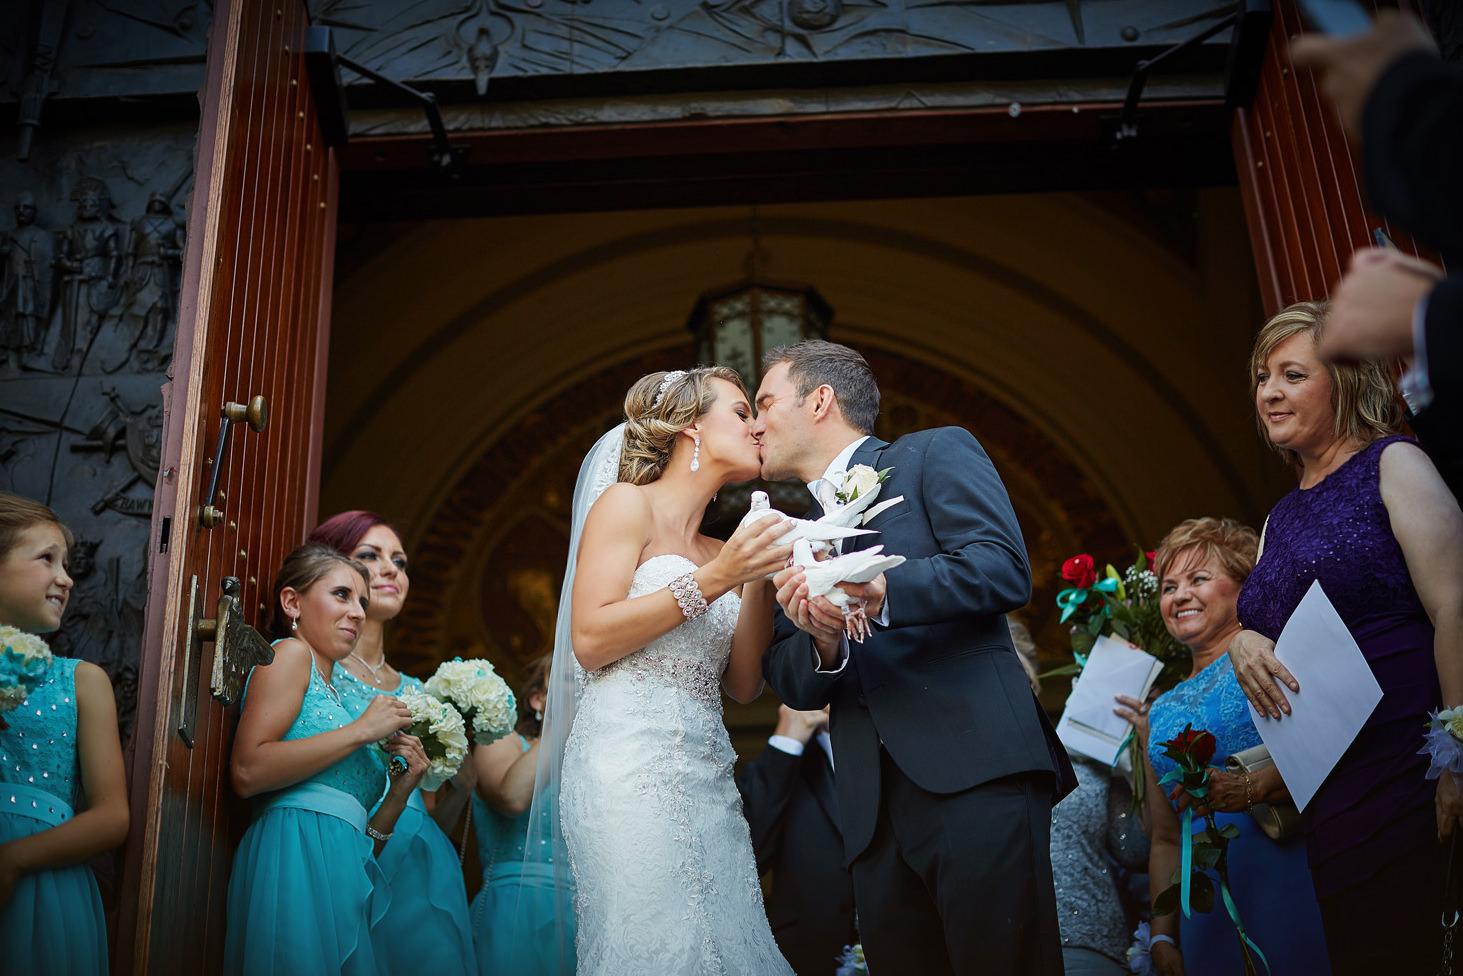 08_Angelica_3P4C4057 Chicago Summer Wedding - Angelica & Pawel